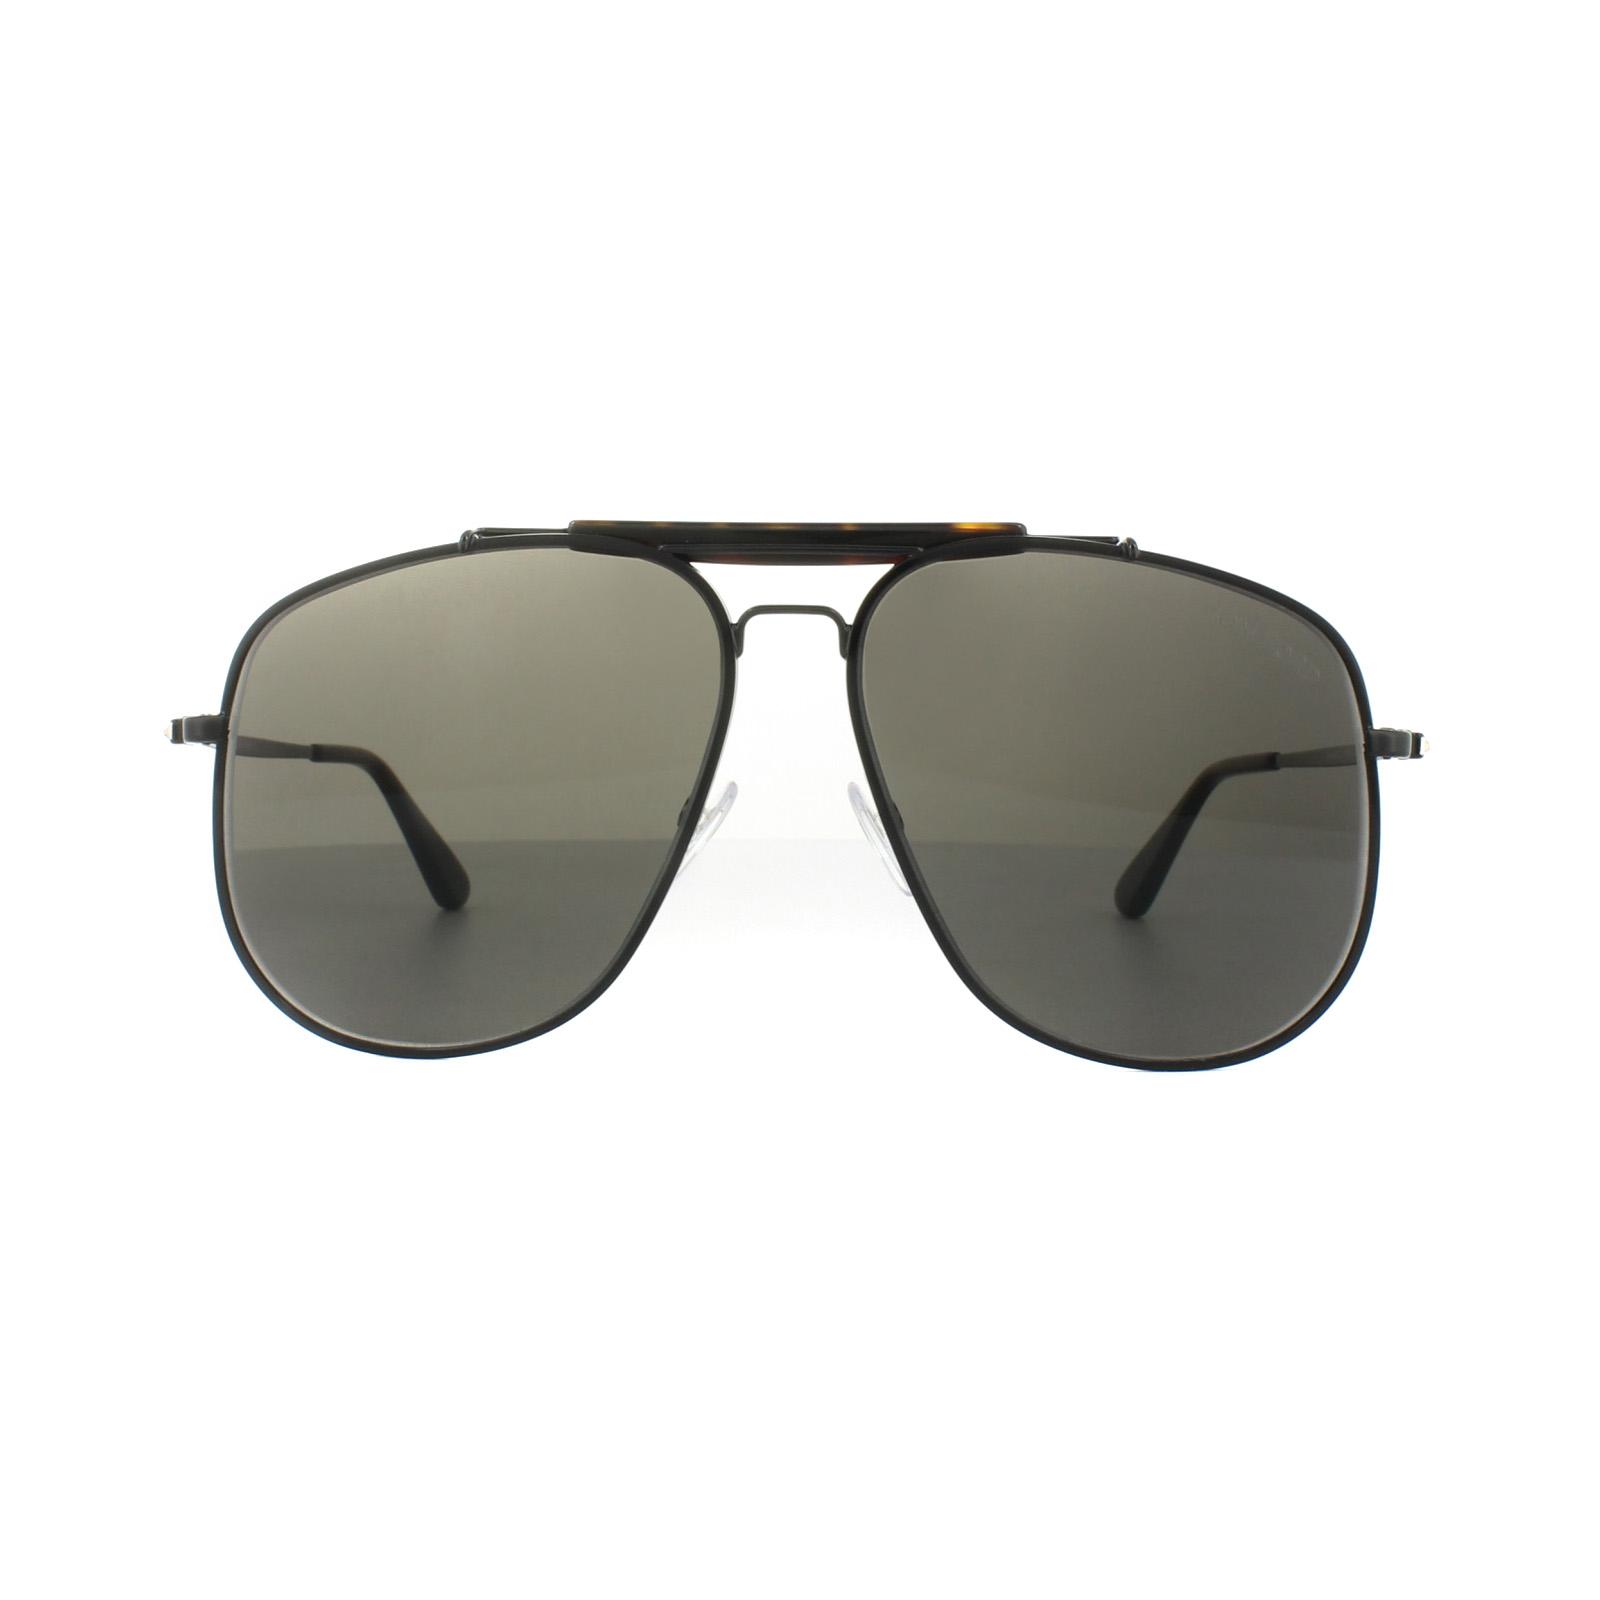 f99ea4b78d565 Cheap Tom Ford 0557 Connor 02 Sunglasses - Discounted Sunglasses